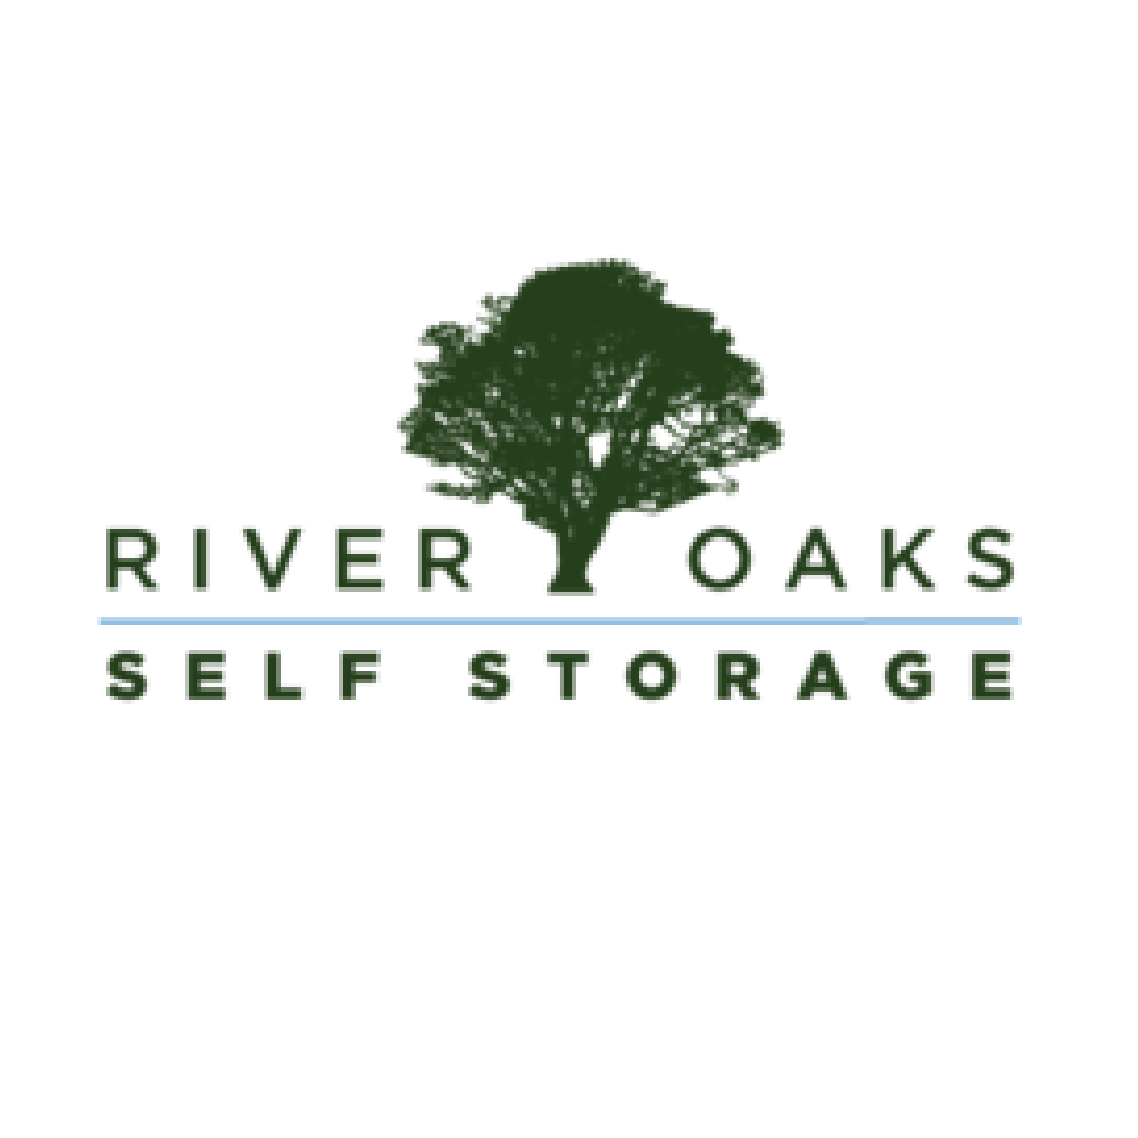 River Oaks Storage - Fort Worth, TX 76114 - (817)886-2468 | ShowMeLocal.com